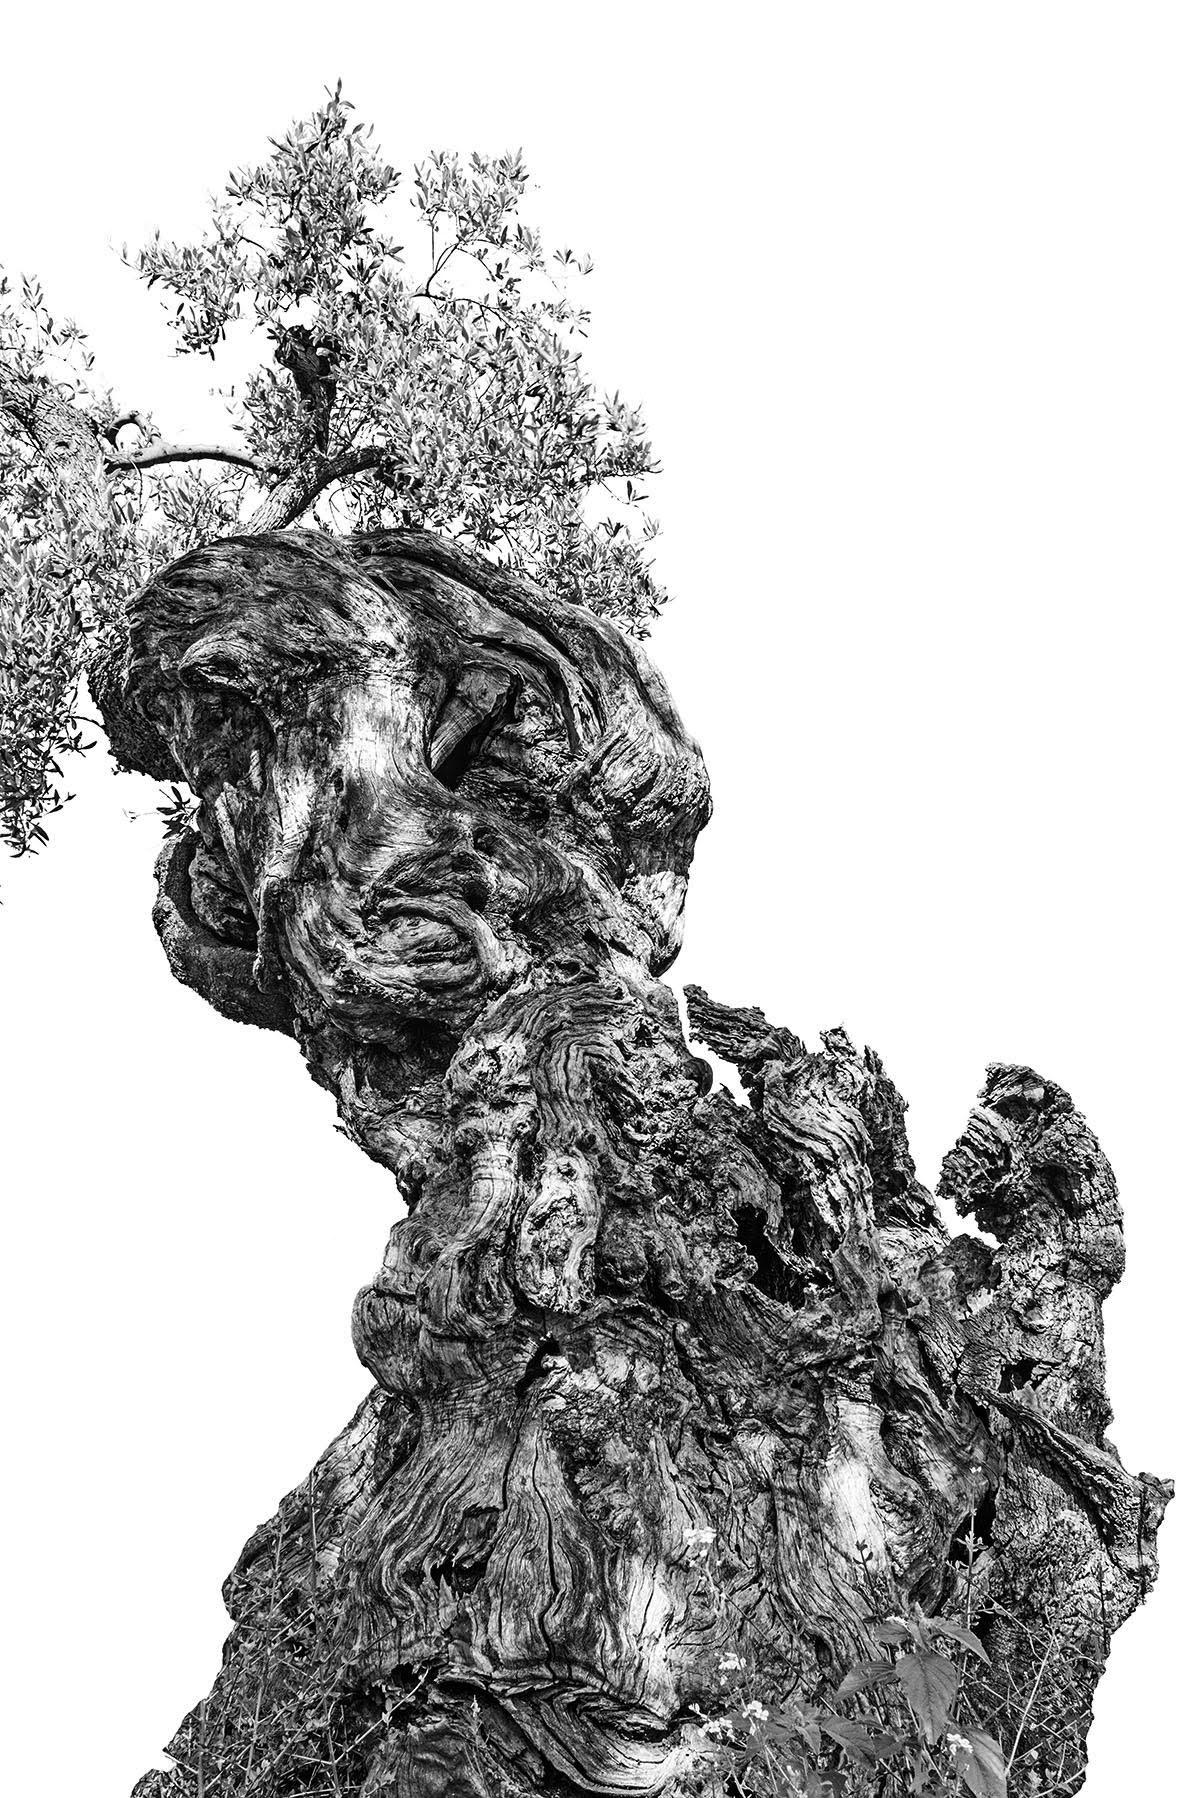 martin-ogolter-Monumentali-nature-landscape-photographer-03